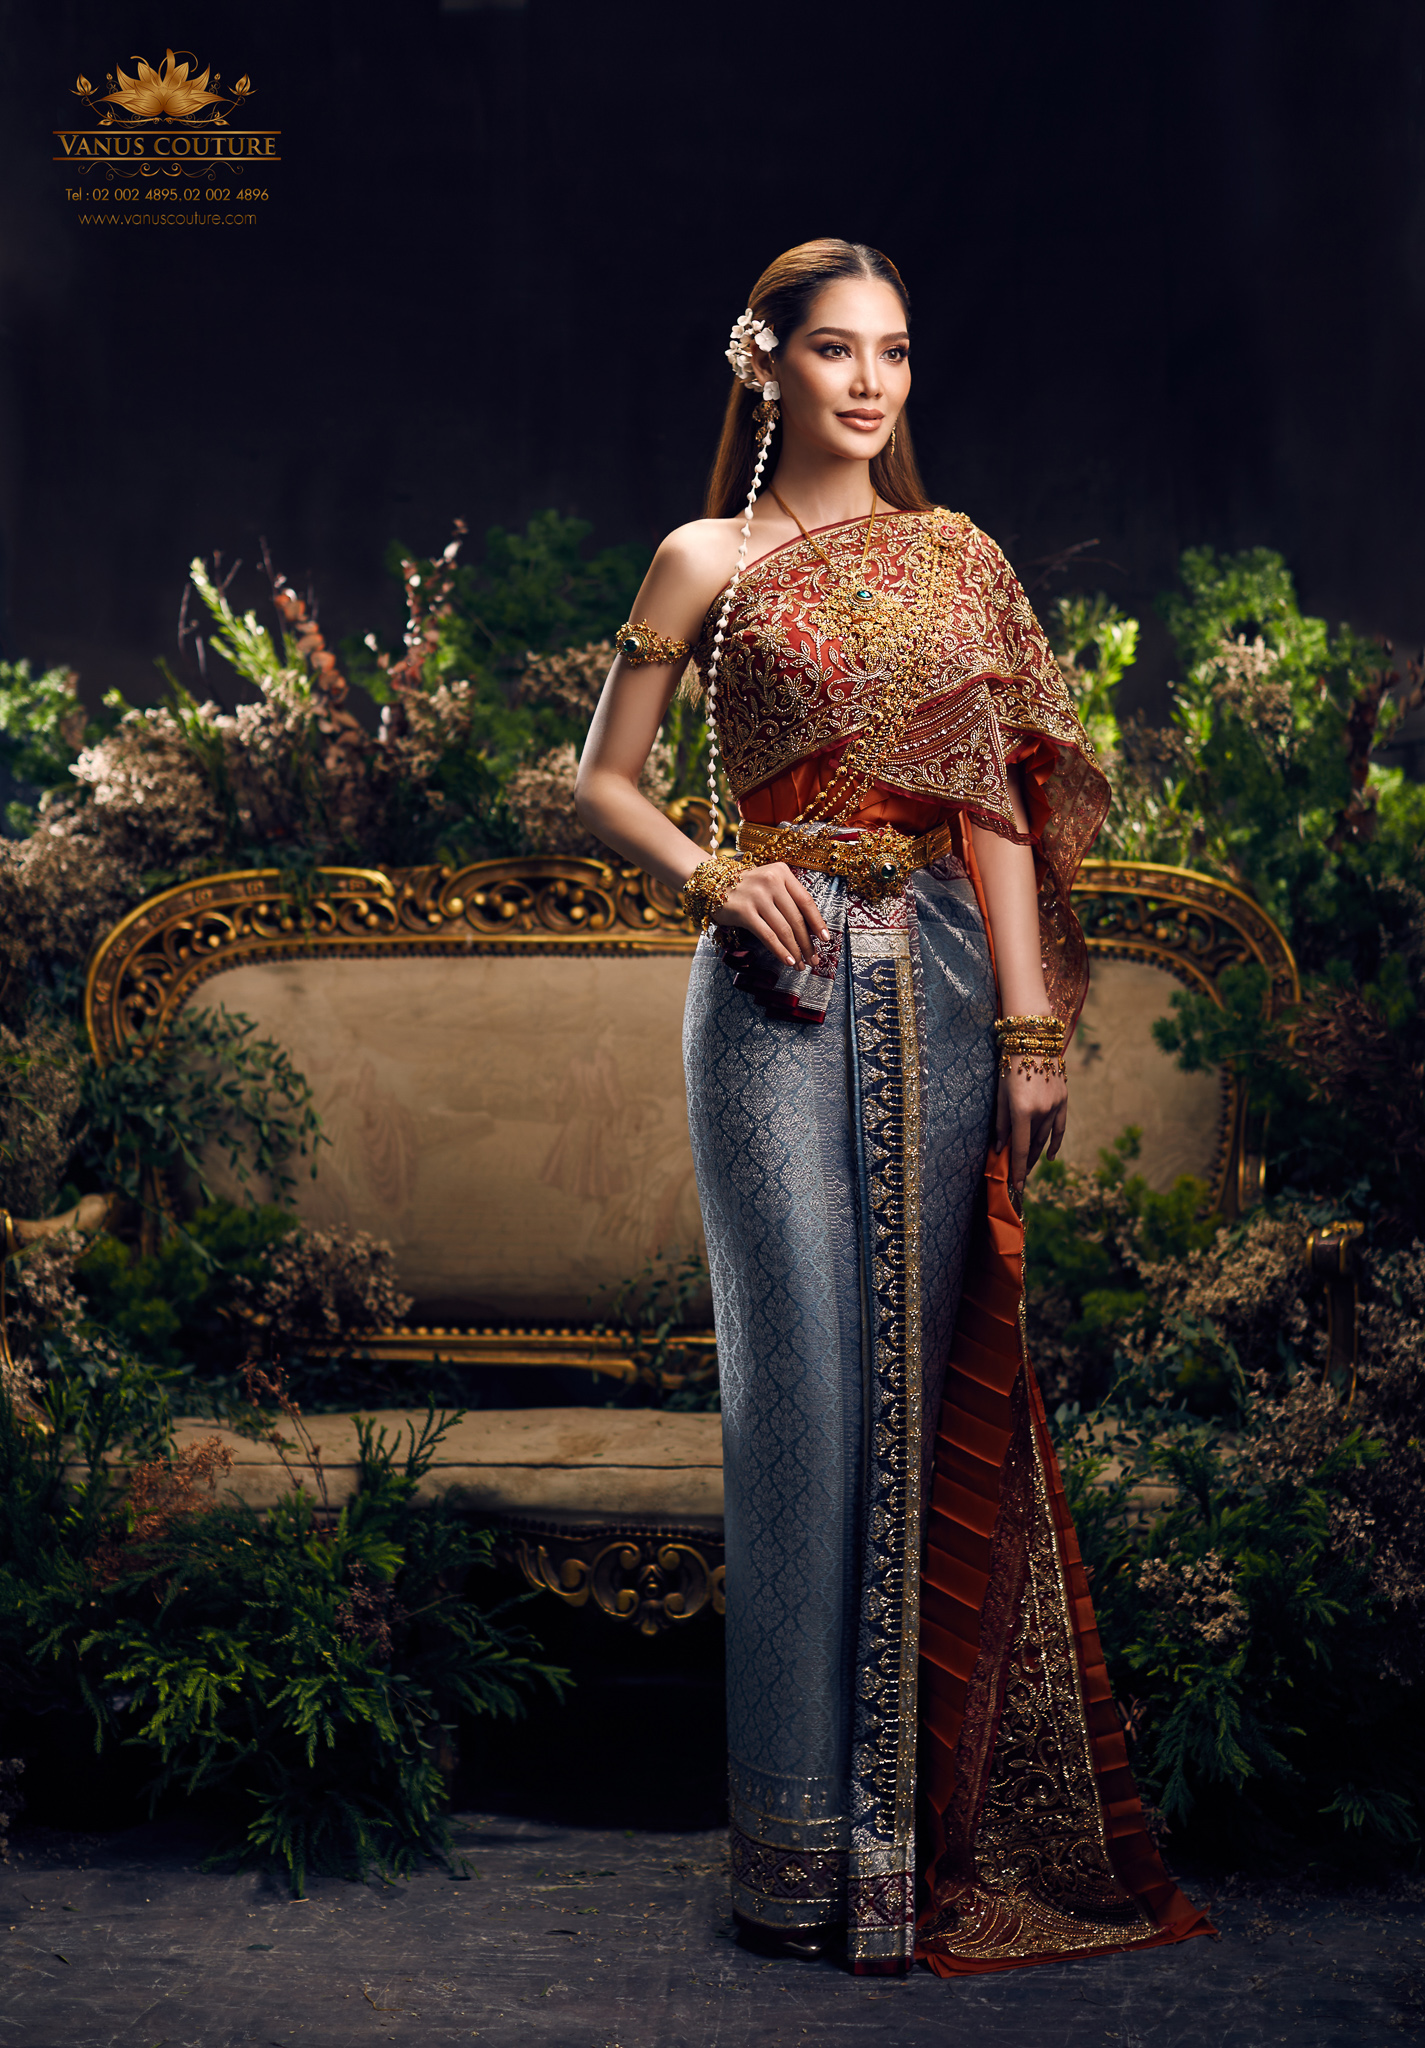 Thai traditional dress - Polfah 01